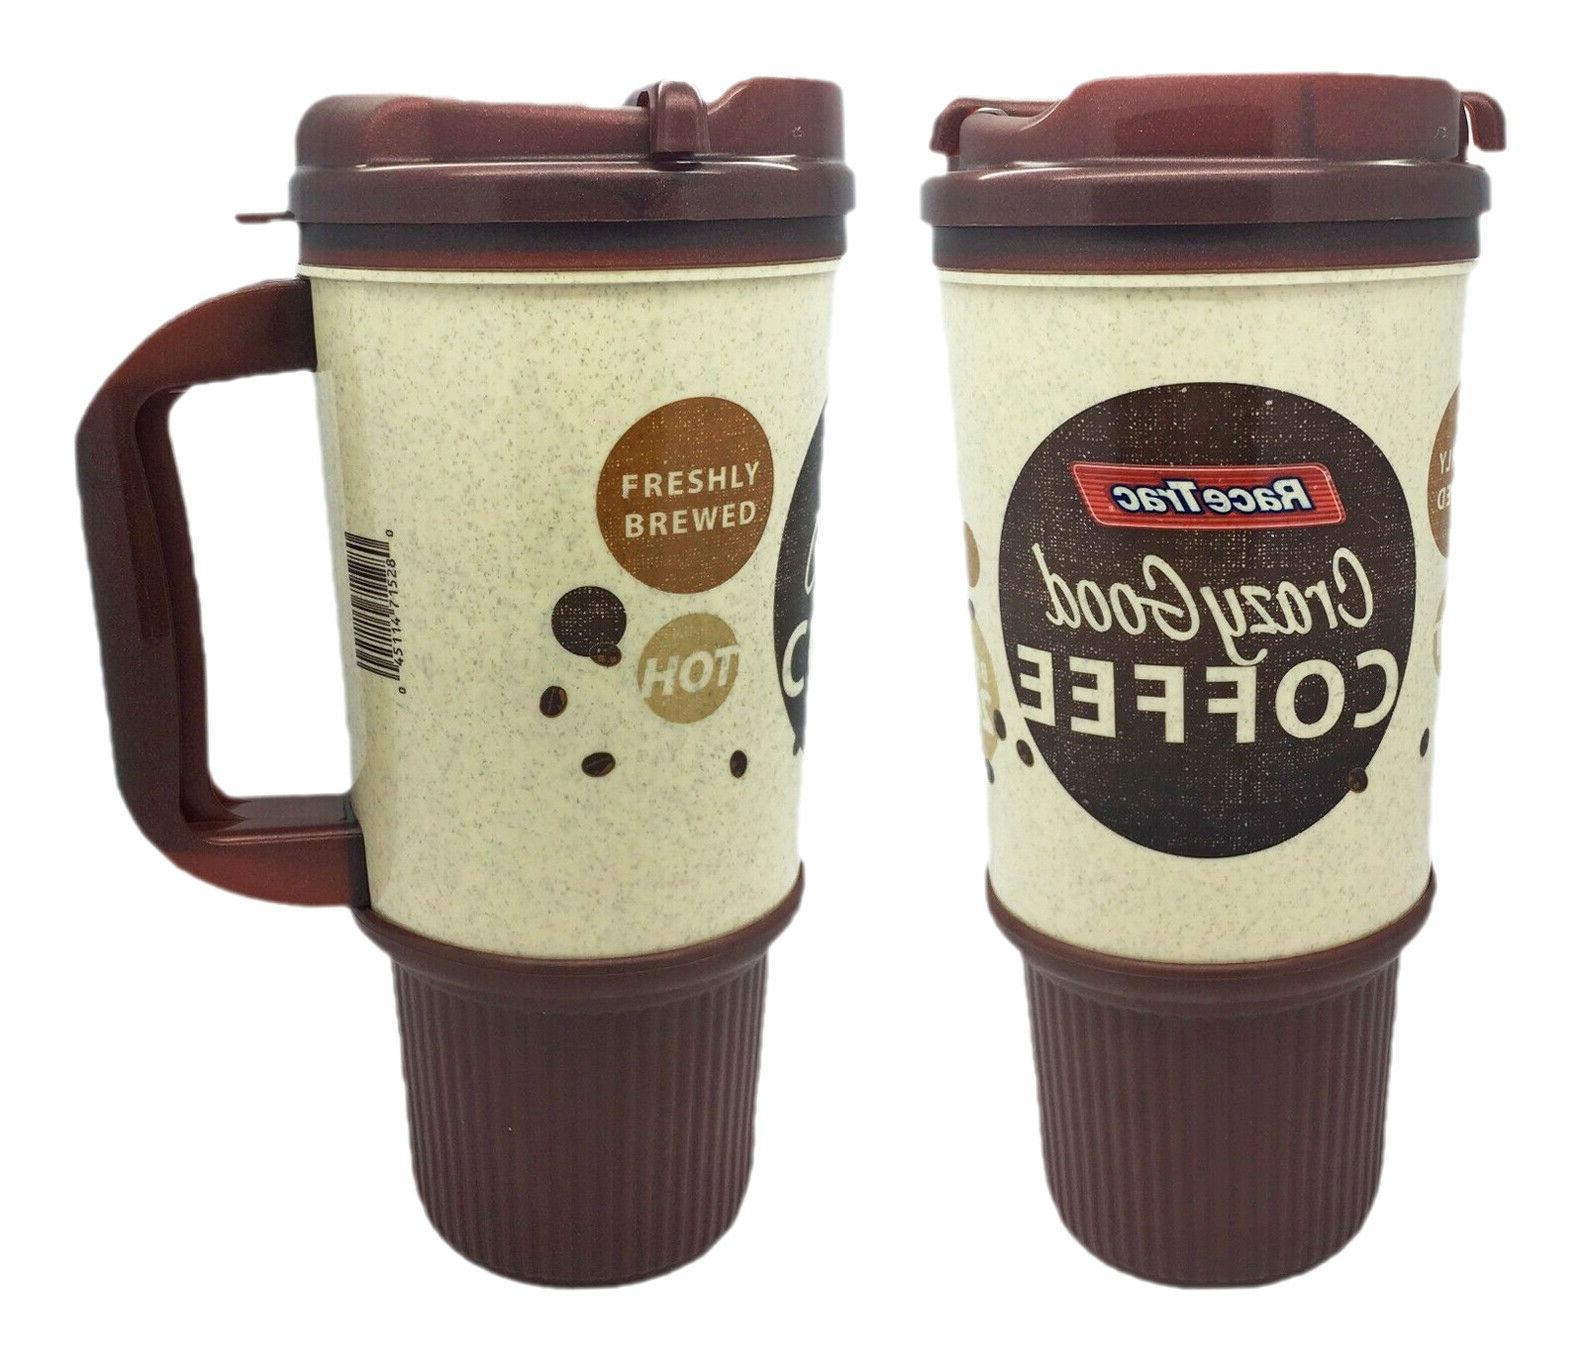 x1 RaceTrac Gas Station Coffee Mug Cup Brown